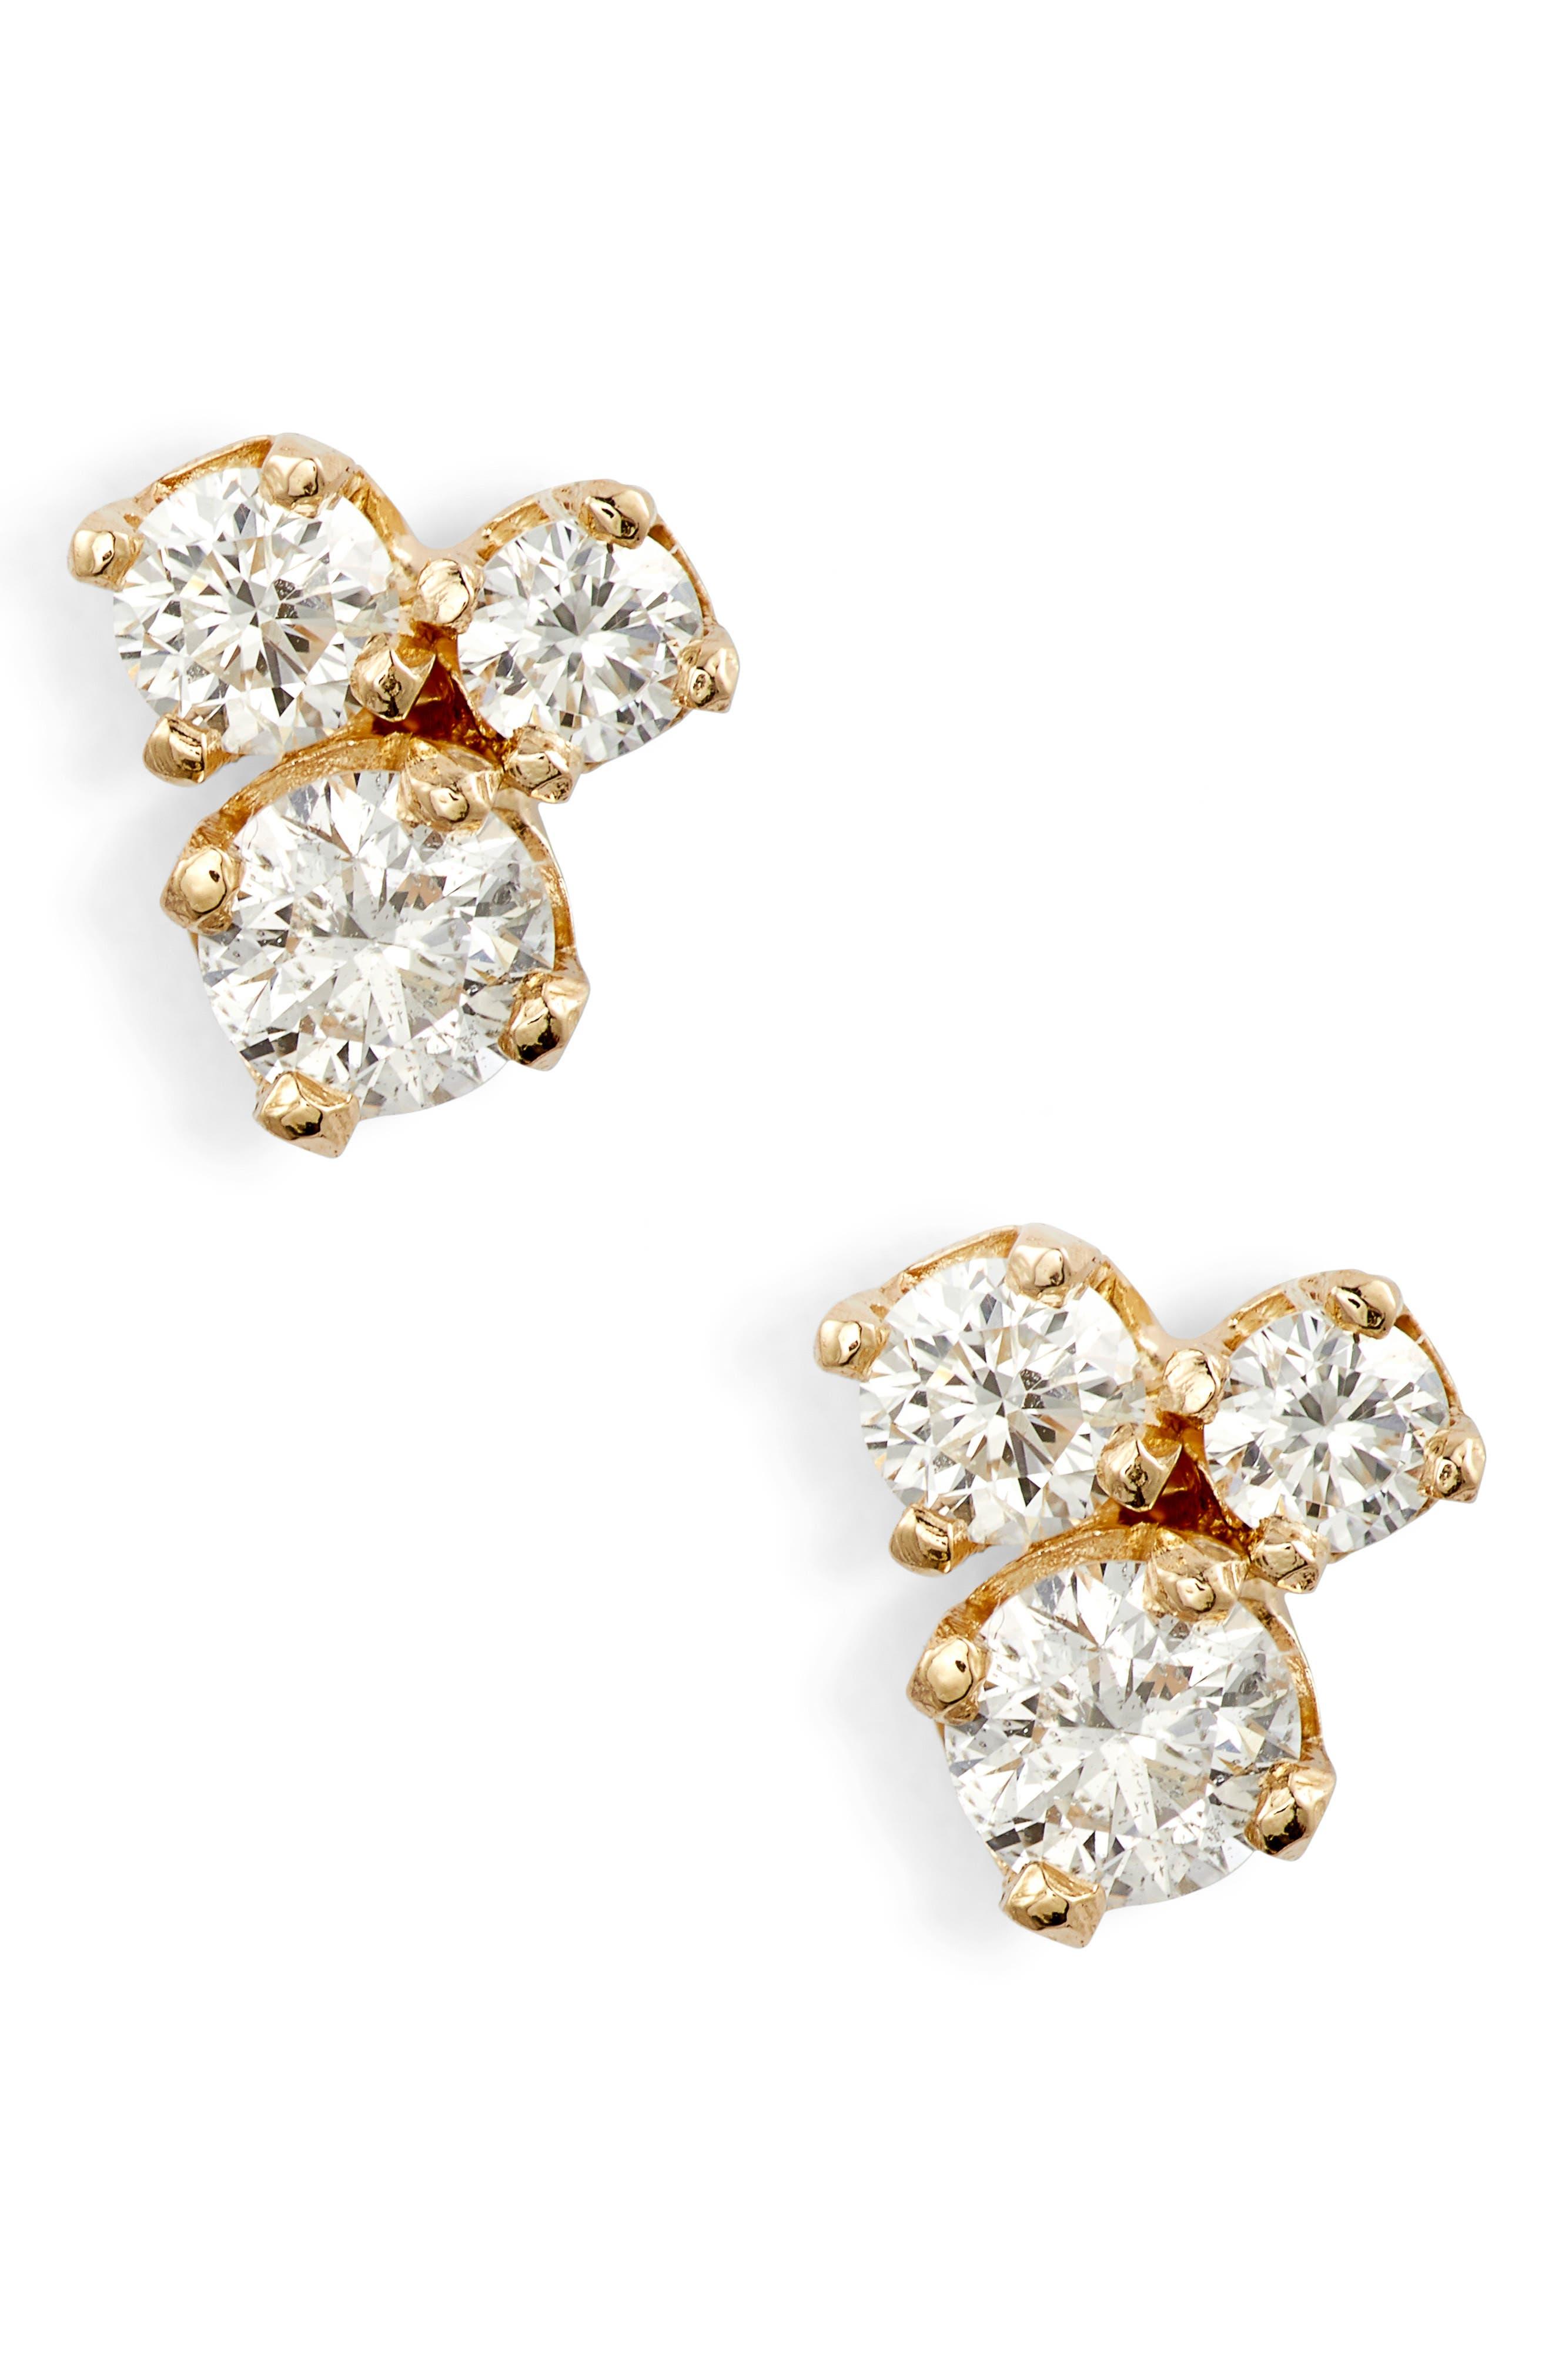 Zoe Chicco Three-Diamond Prong Stud Earrings